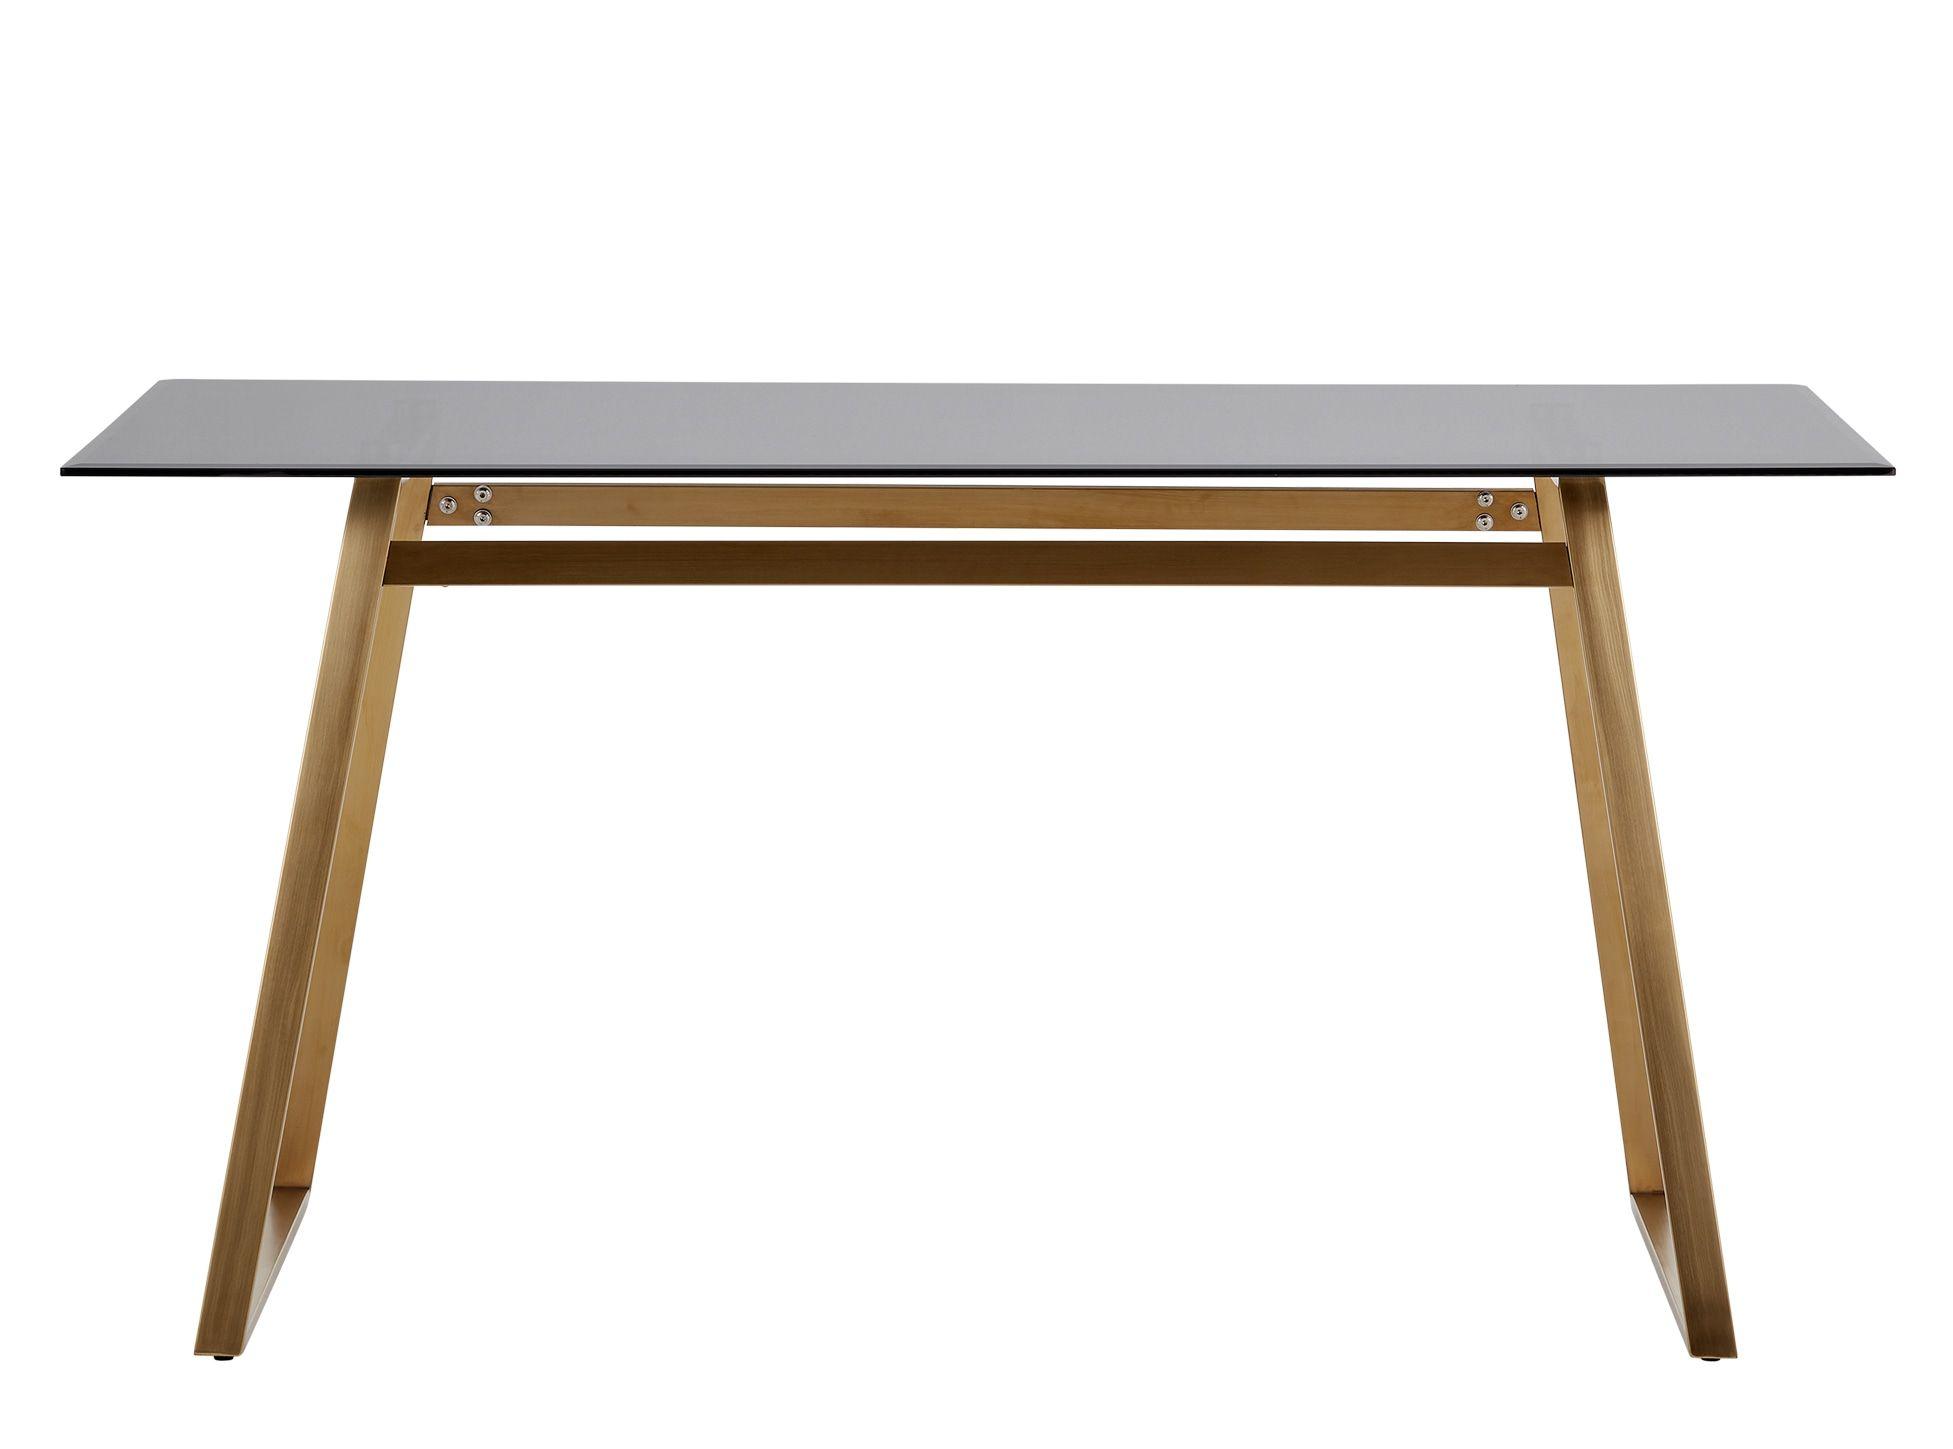 Haku 6 Seat Rectangular Dining Table Brass And Smoked